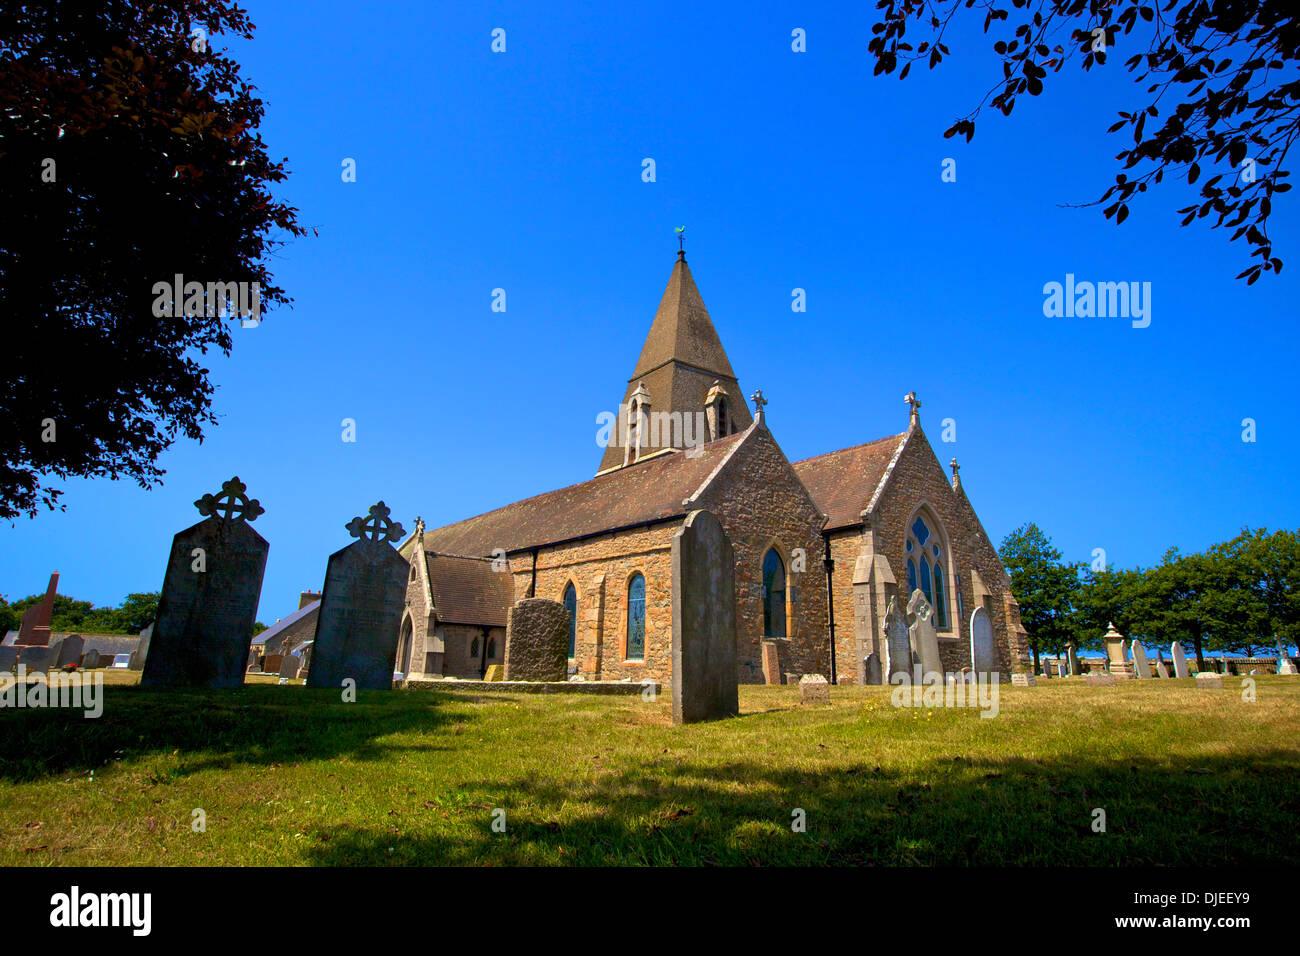 St.Ouen's Church, St. Ouen, Jersey, Channel Islands Stock Photo ...